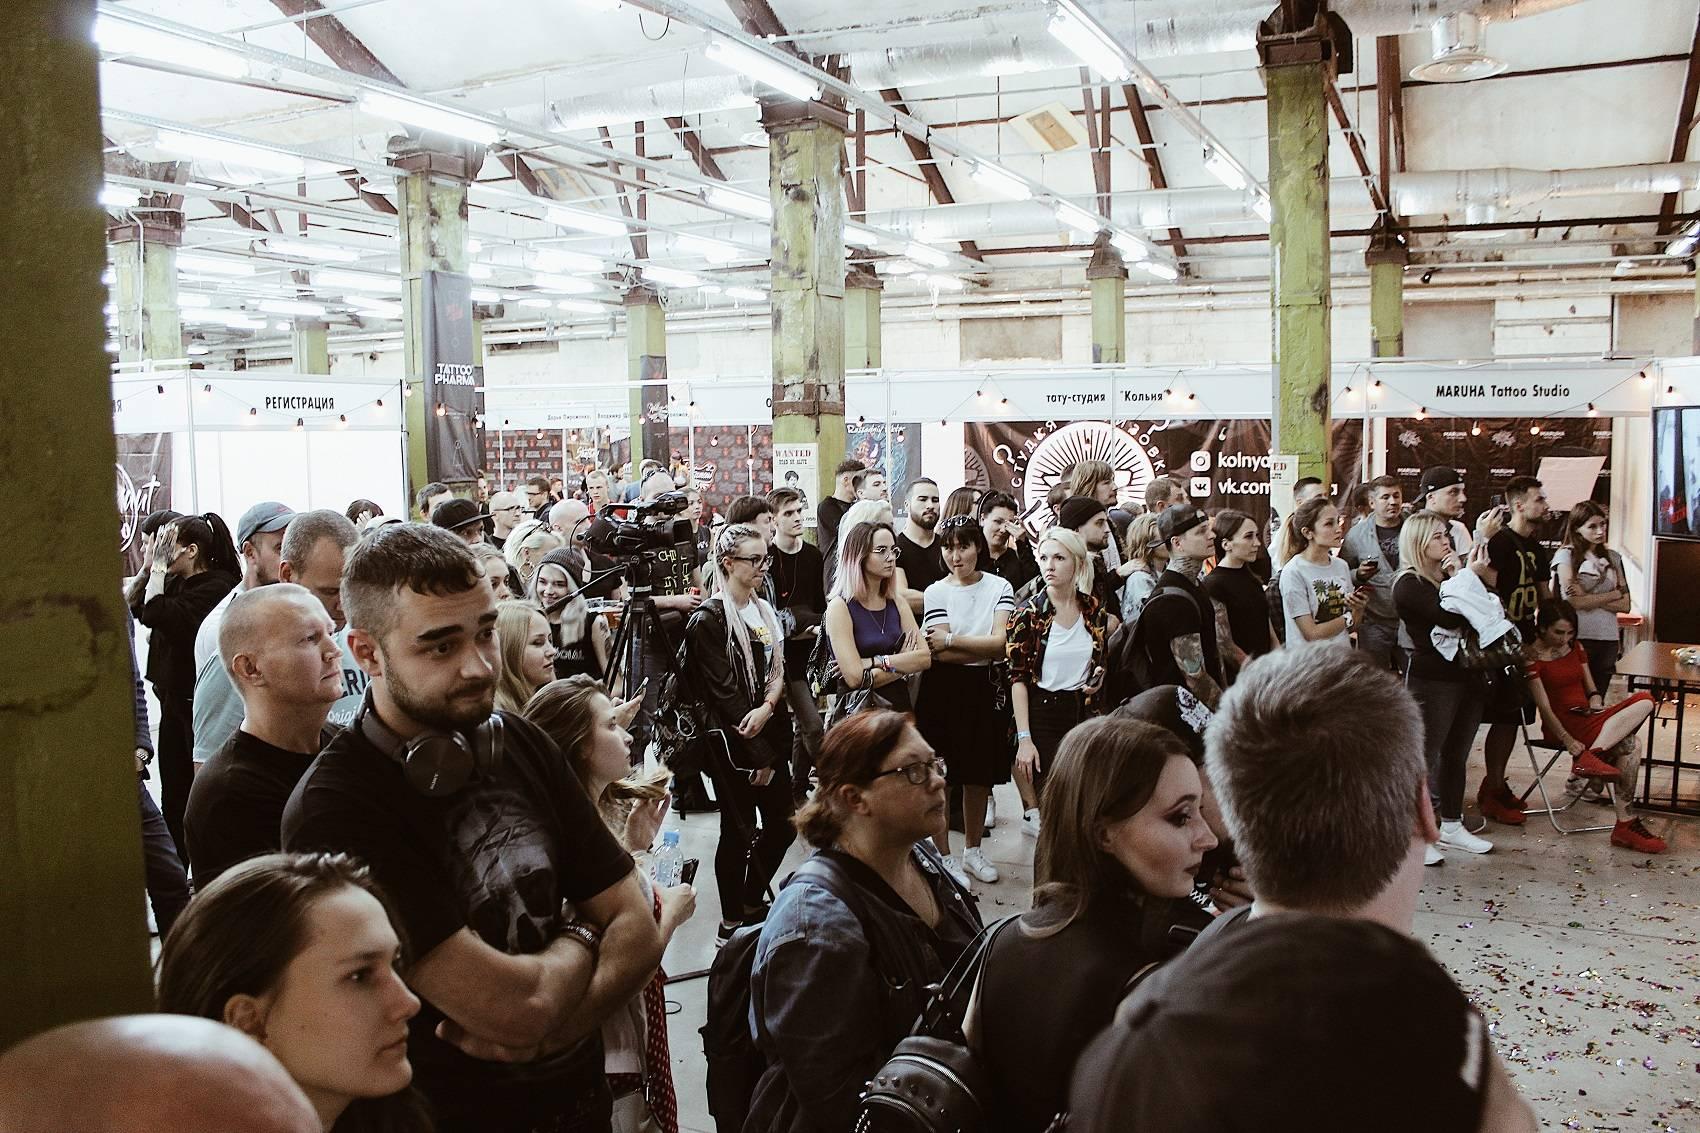 Тату фестиваль International Moscow Tattoo Week 2018 - Stone Forest